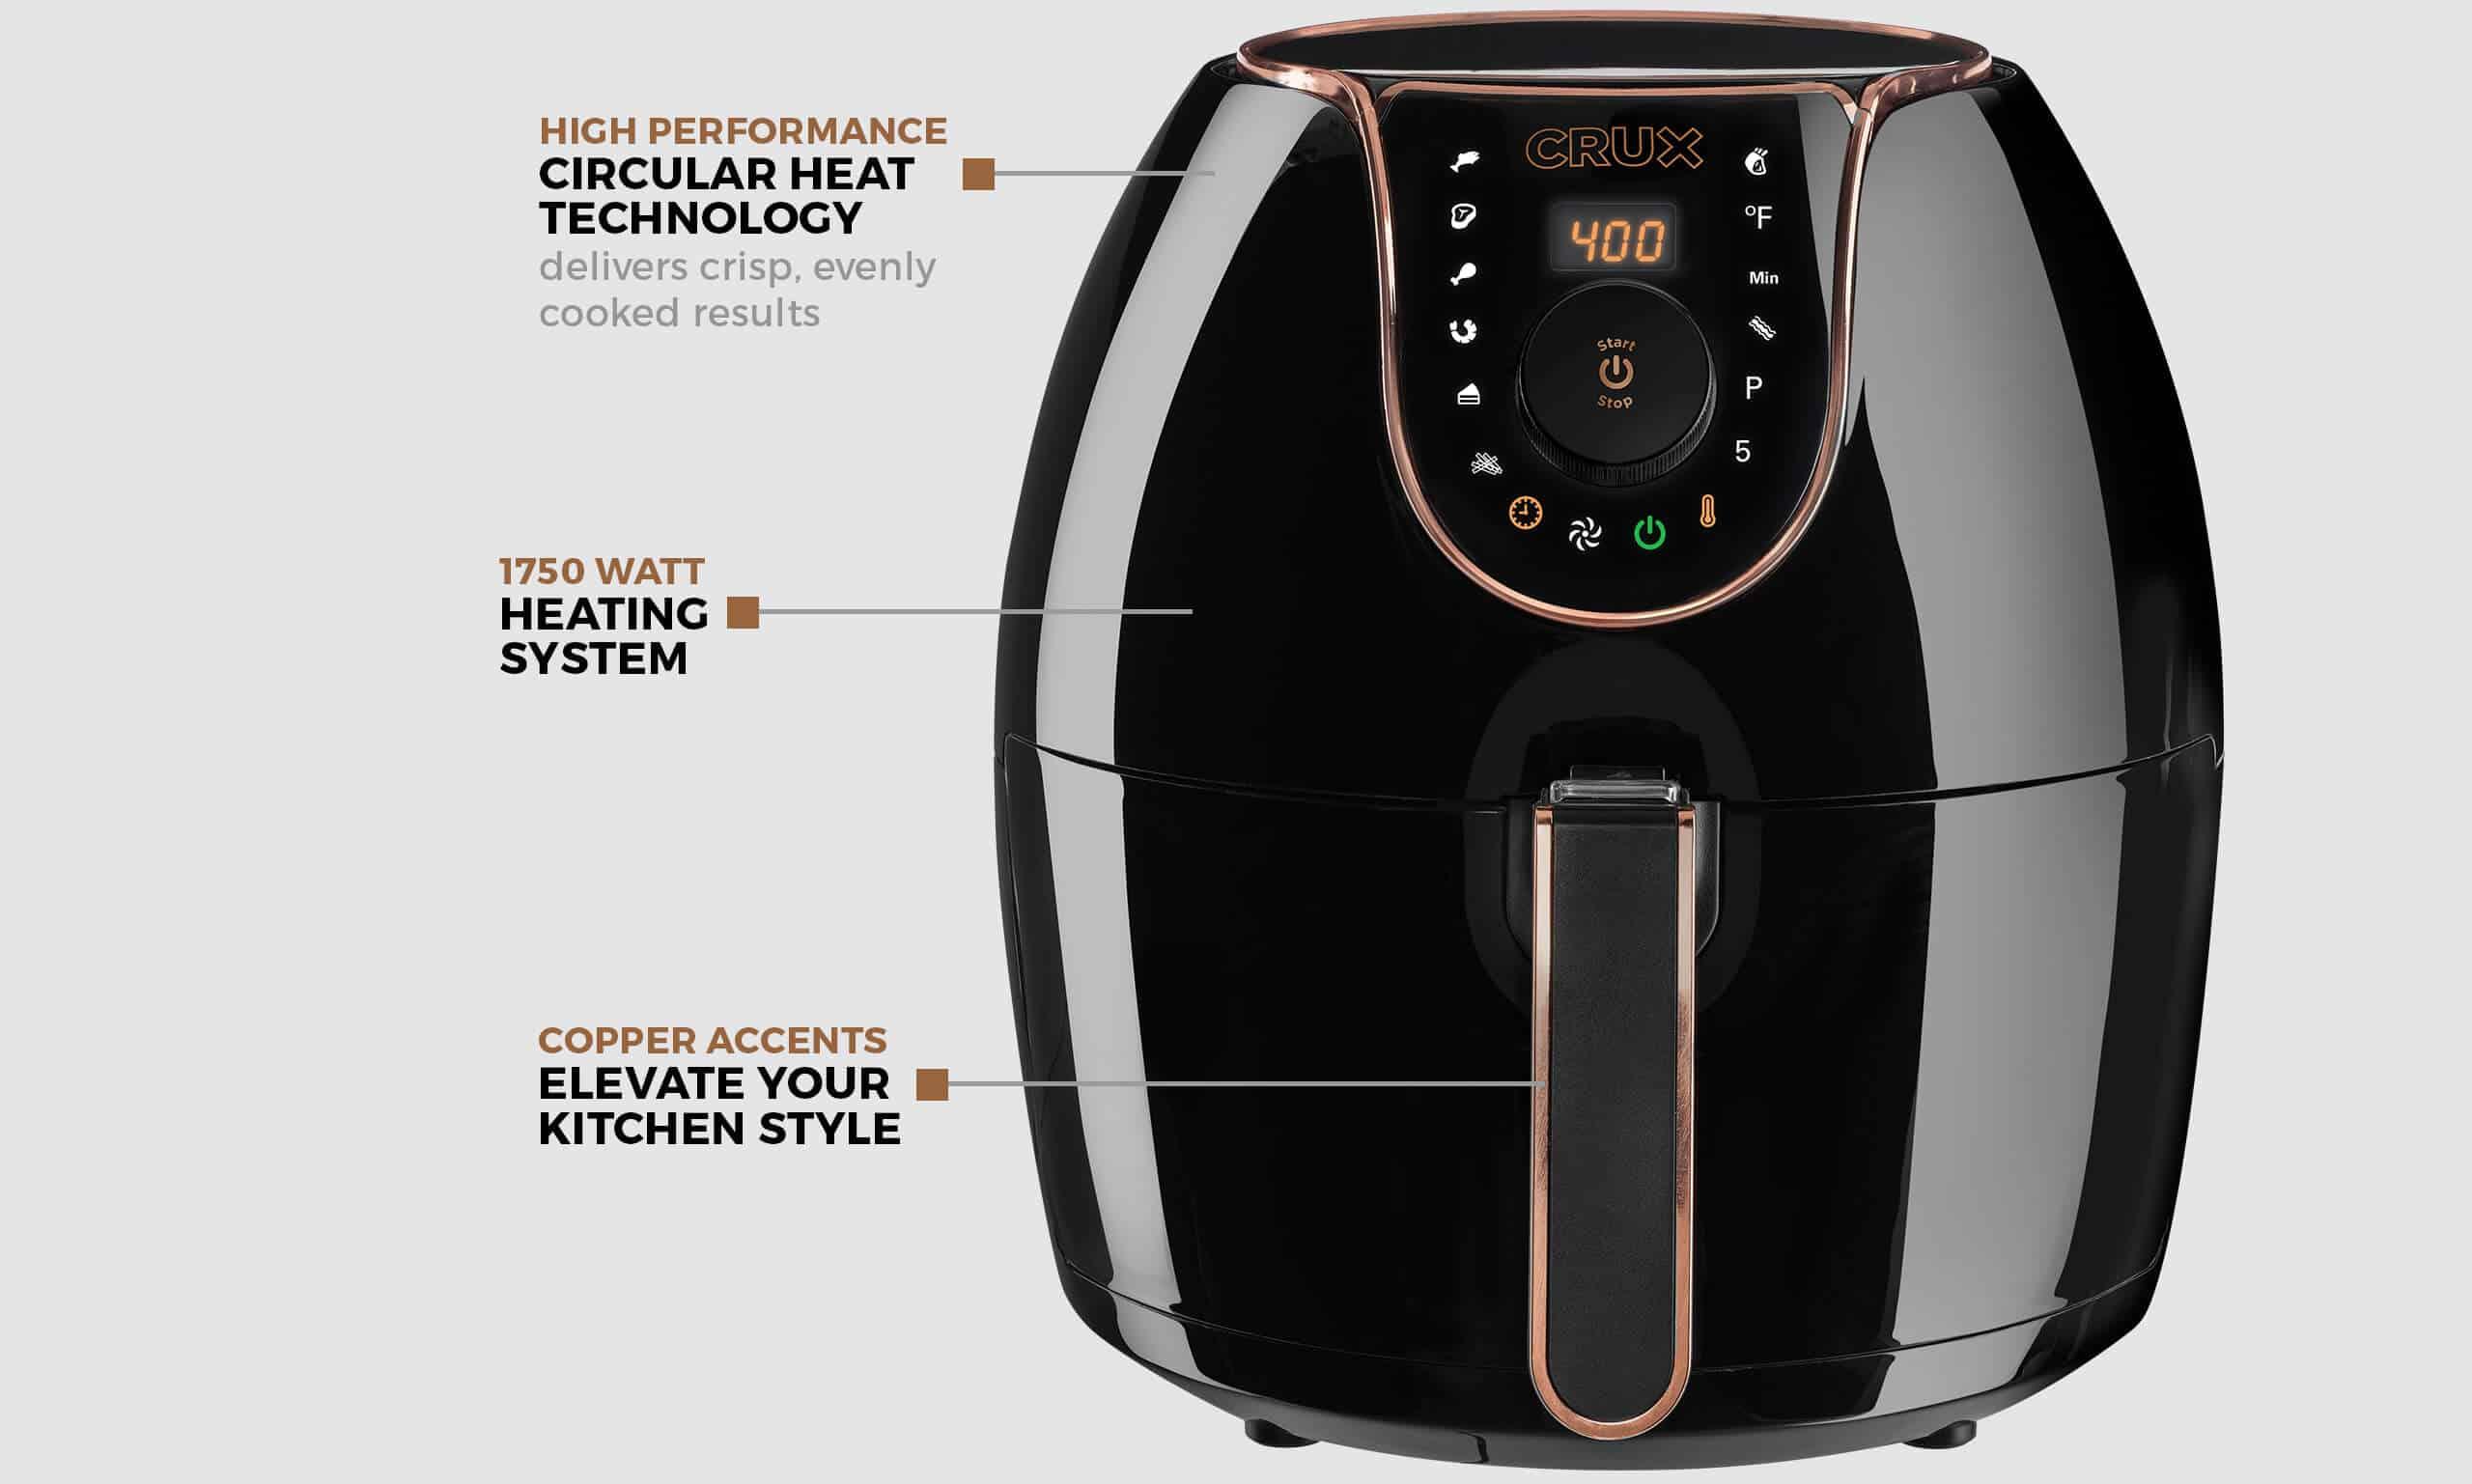 Crux 5.3-Qt. Digital Air Convection Fryer